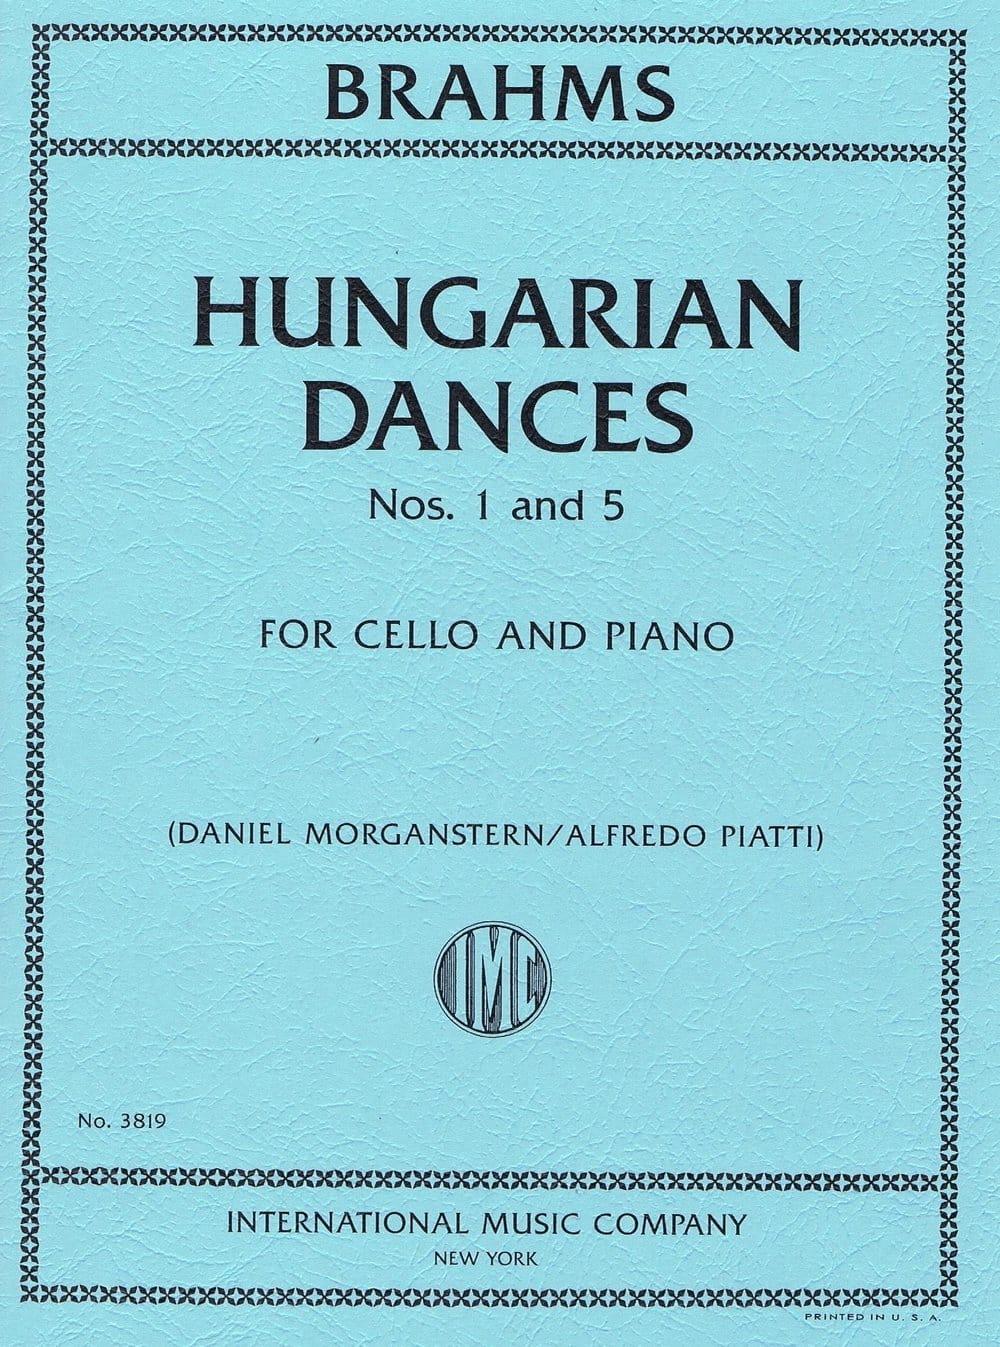 Danses Hongroises N° 1 et 5 - BRAHMS - Partition - laflutedepan.com